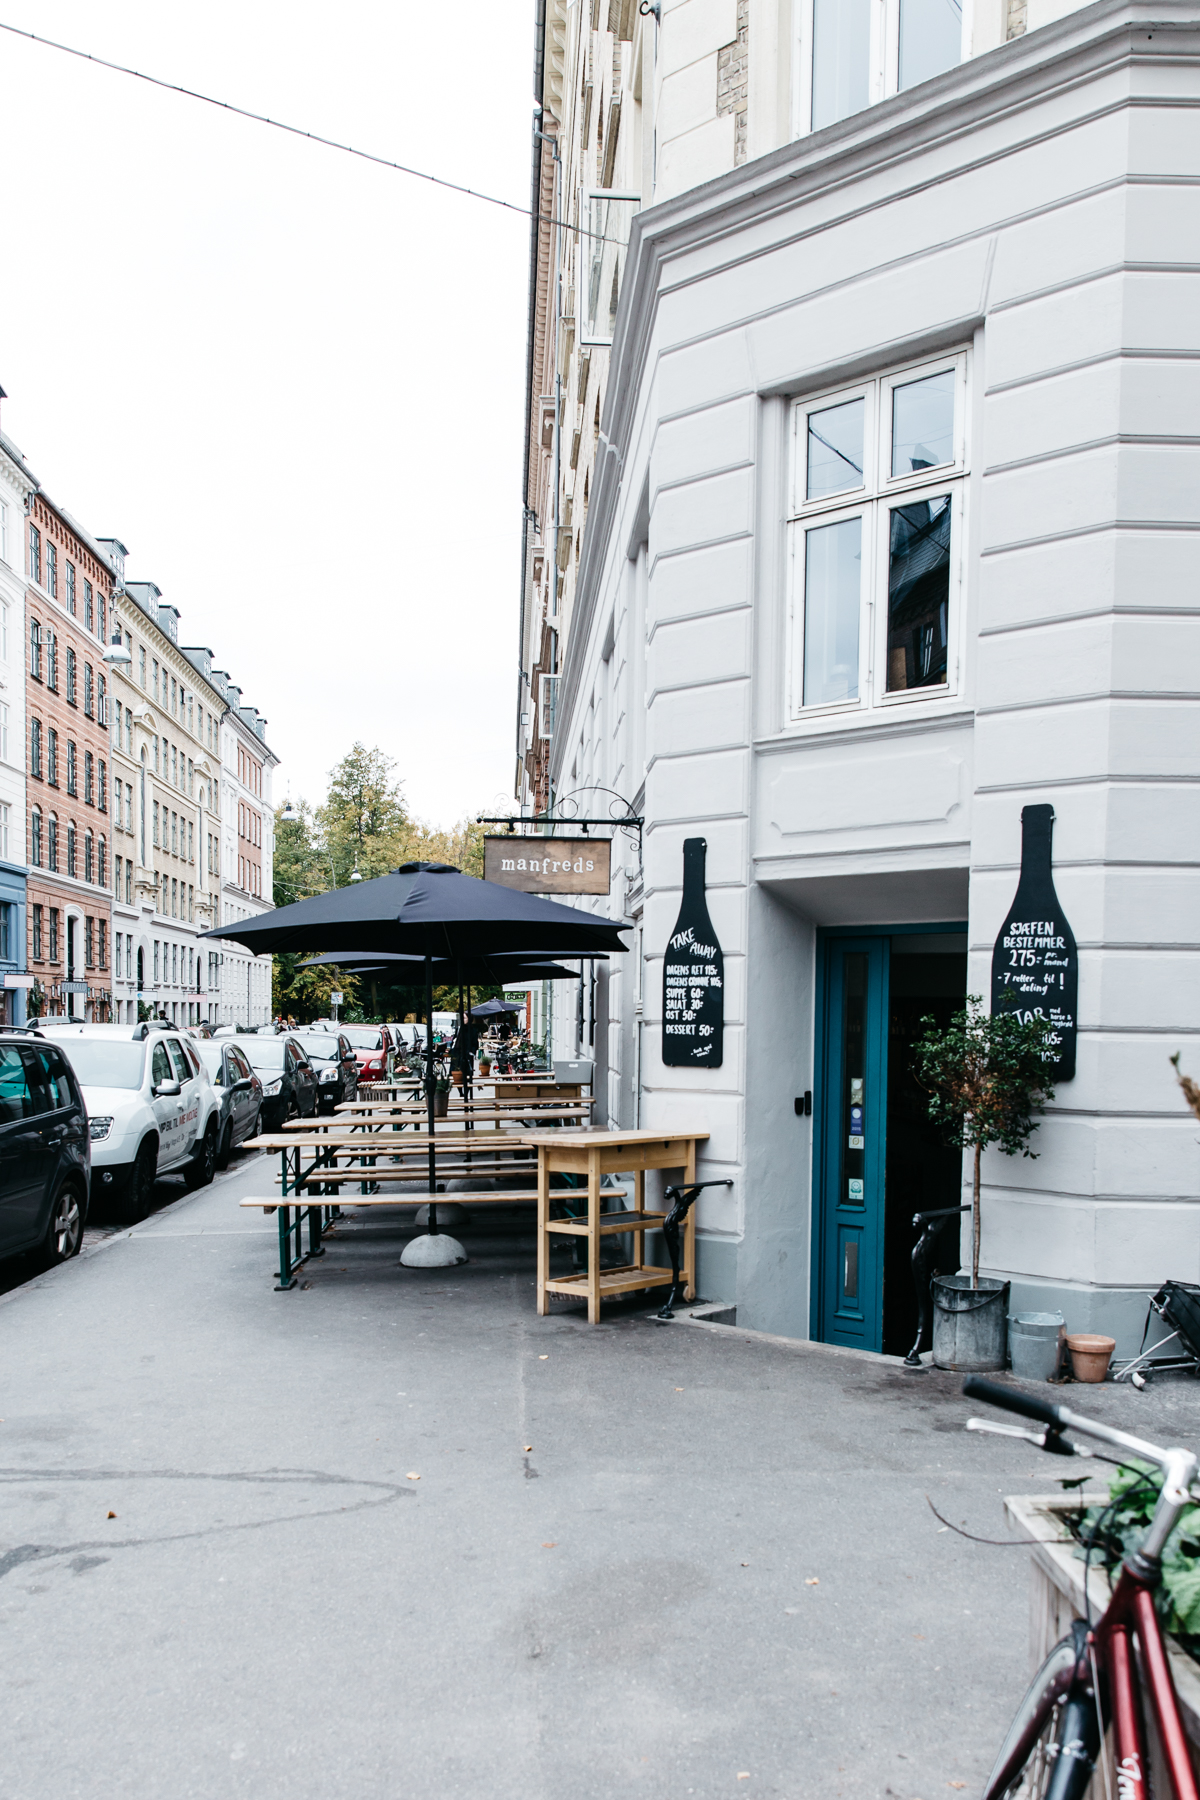 cph-Jægersborggade---6.jpg